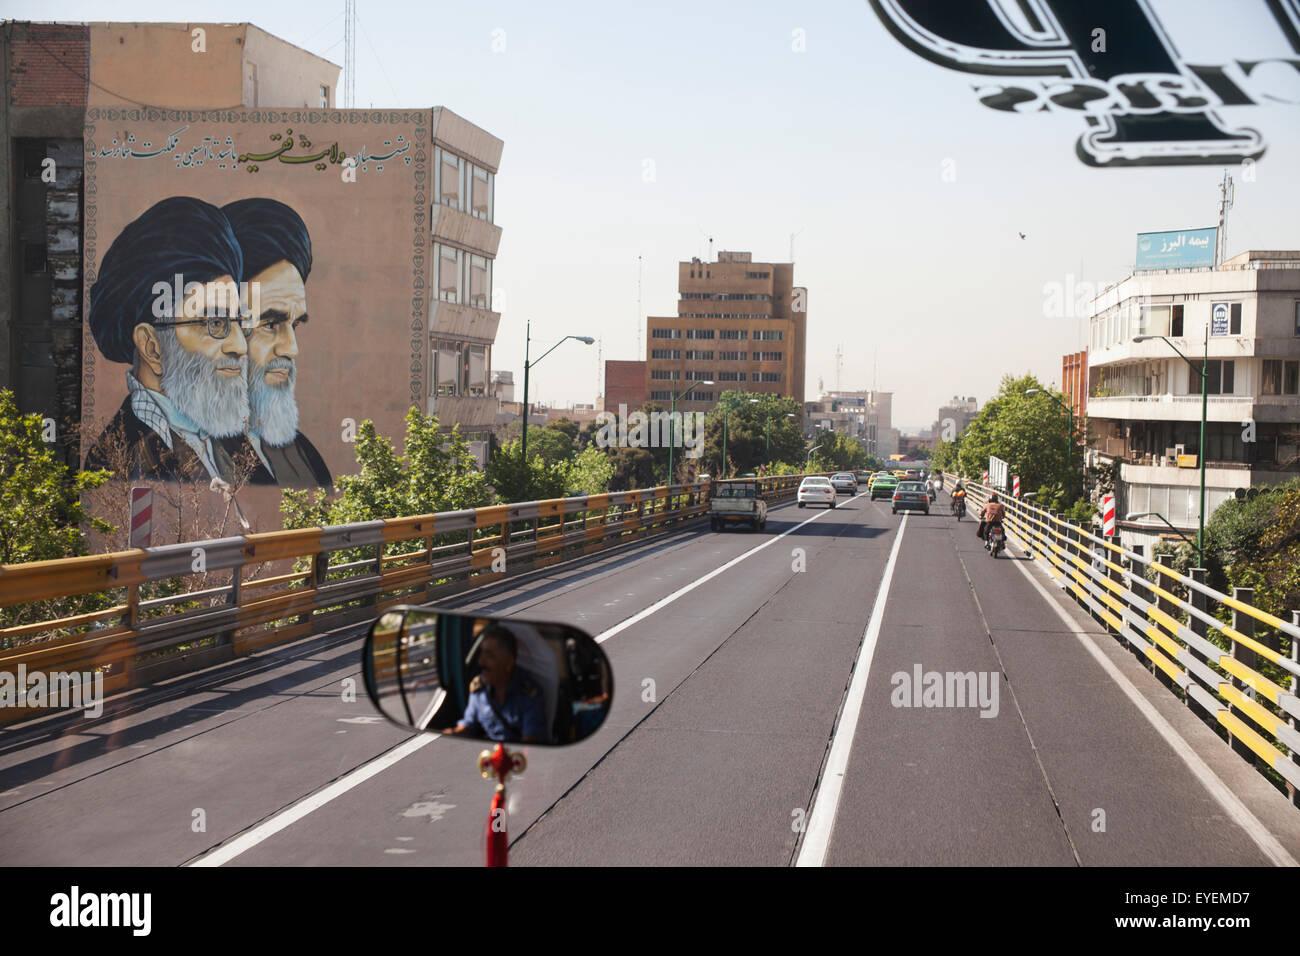 Wall portraits of Supreme Leader Ayatollah Ali Khamenei and Ayatollah Khomeini, beside expressway, Central Tehran; Stock Photo